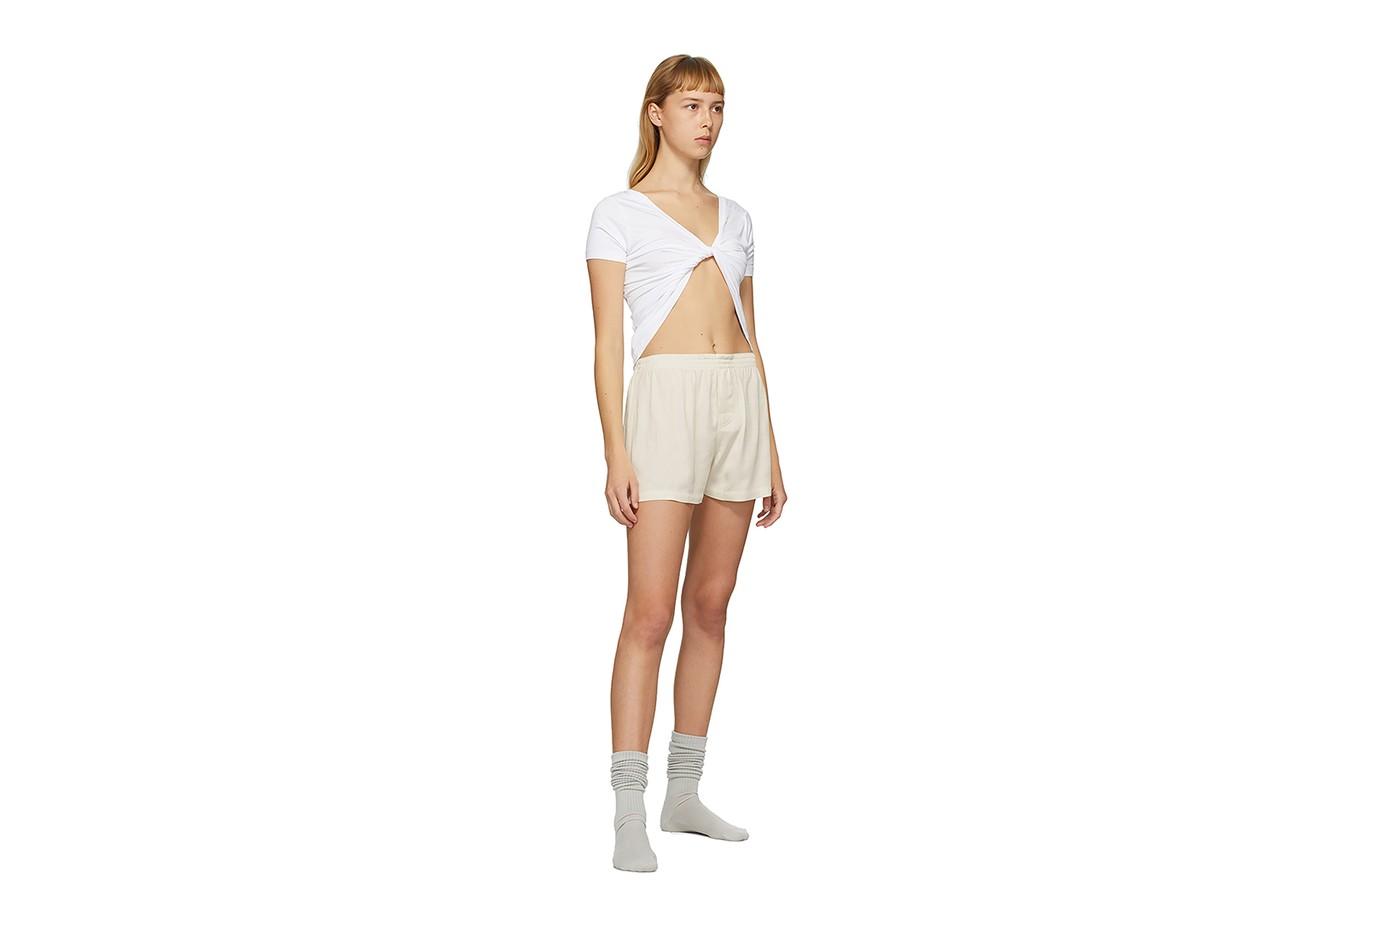 jacquemus loungewear capsule collection shirt bra shorts ssense online release